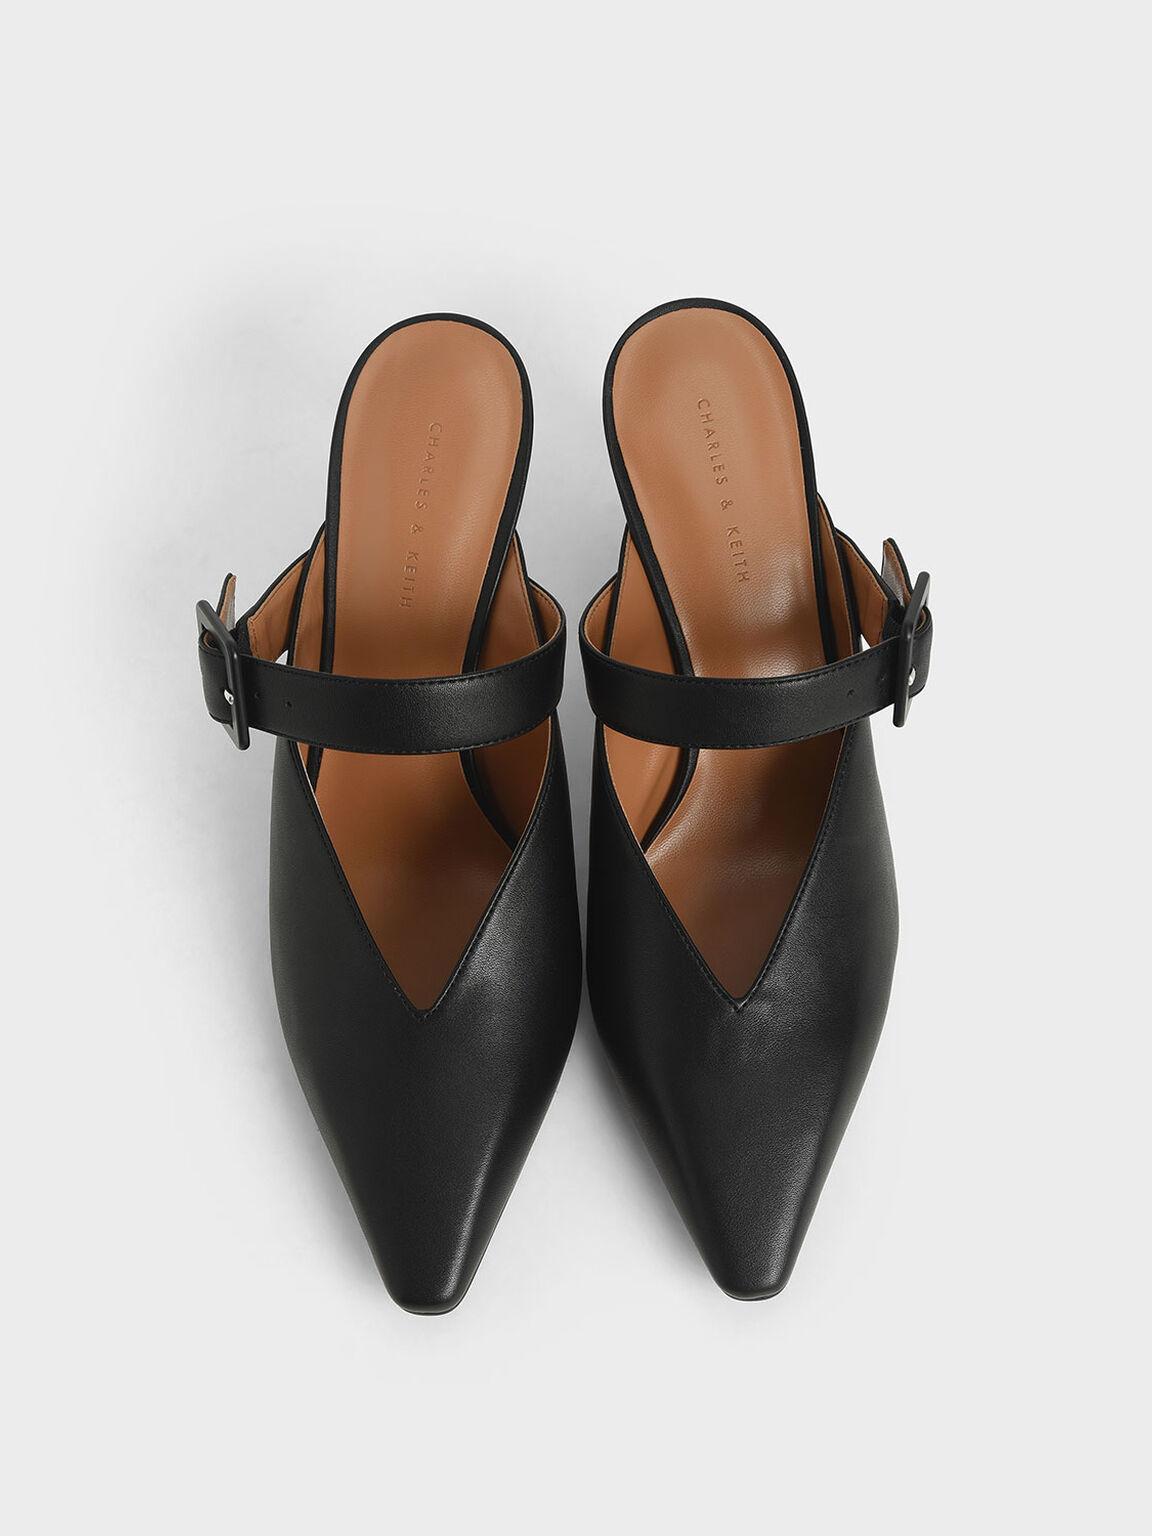 Mary Jane Strap Stiletto Mules, Black, hi-res